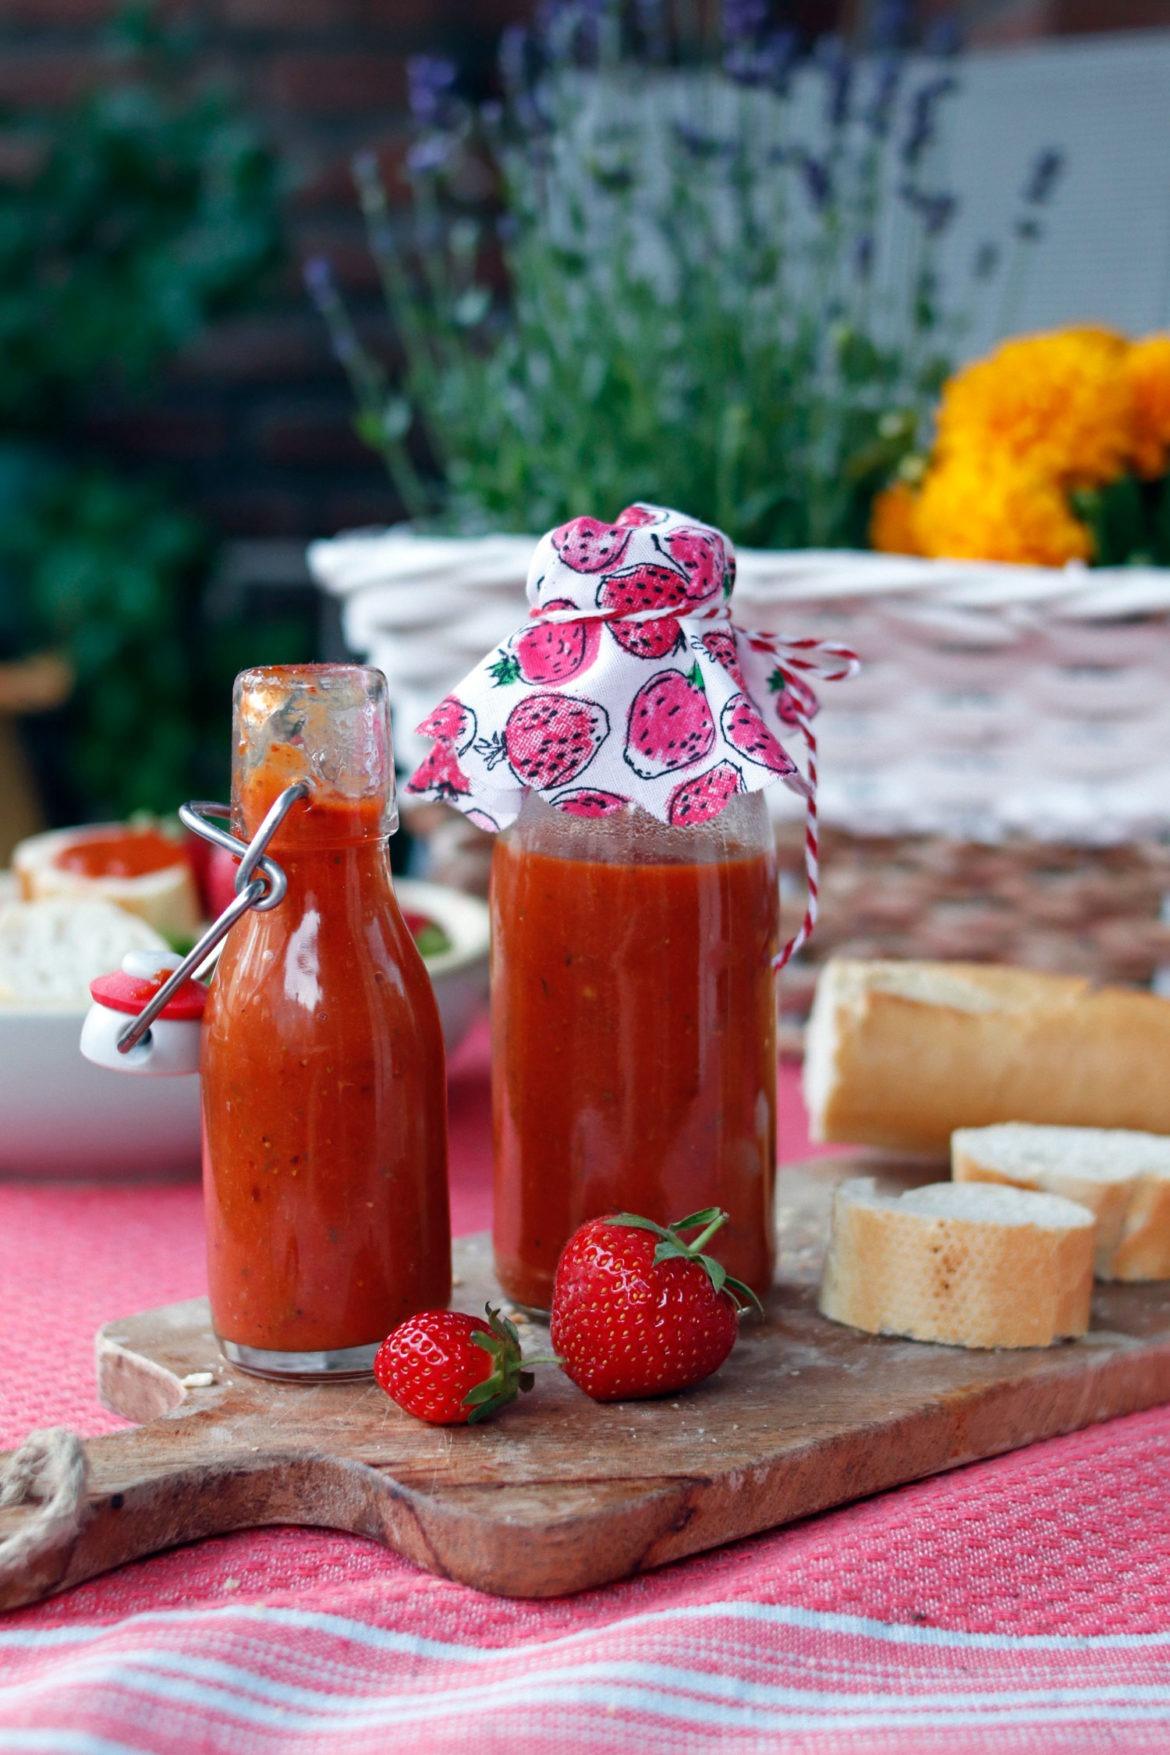 Selbst gemachter Ketchup aus Erdbeeren. Erdbeerketchup selber machen. #erdbeerrezepte #einmachen #erdbeeren #ketchup